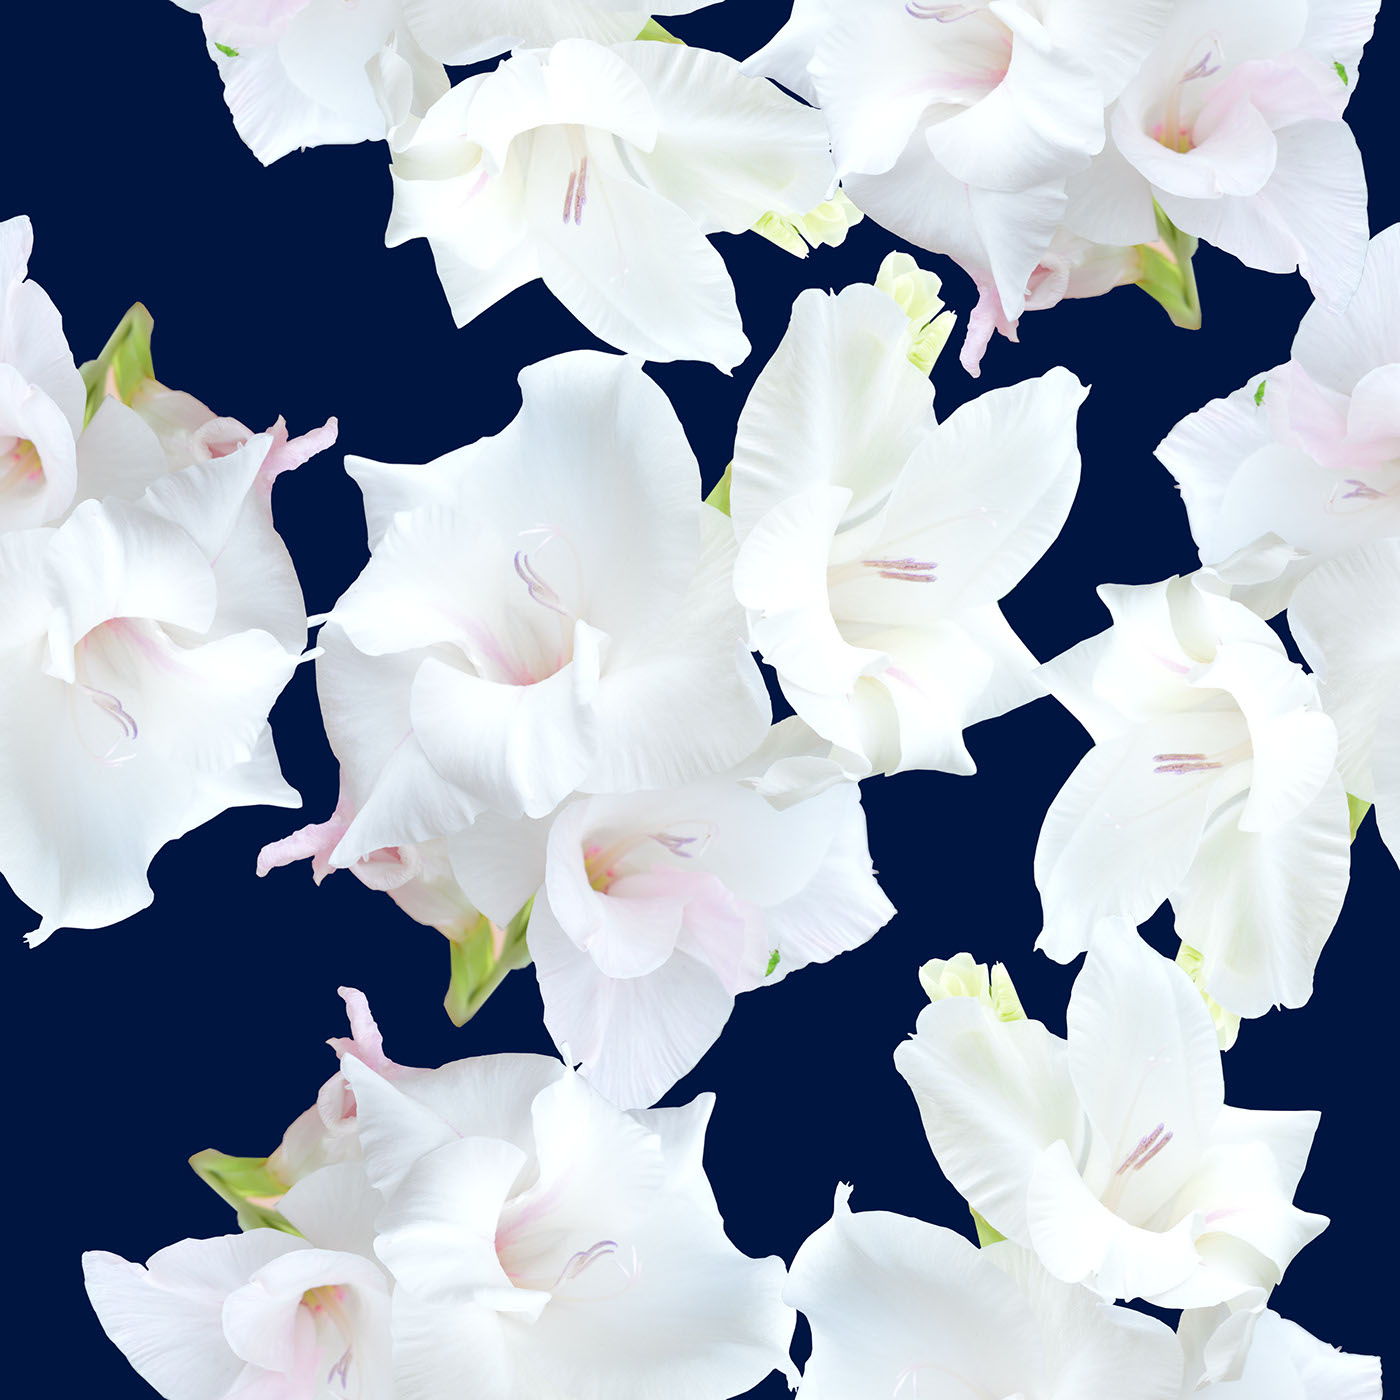 White gladiolus flower pattern on behance gladiolus flower pattern mightylinksfo